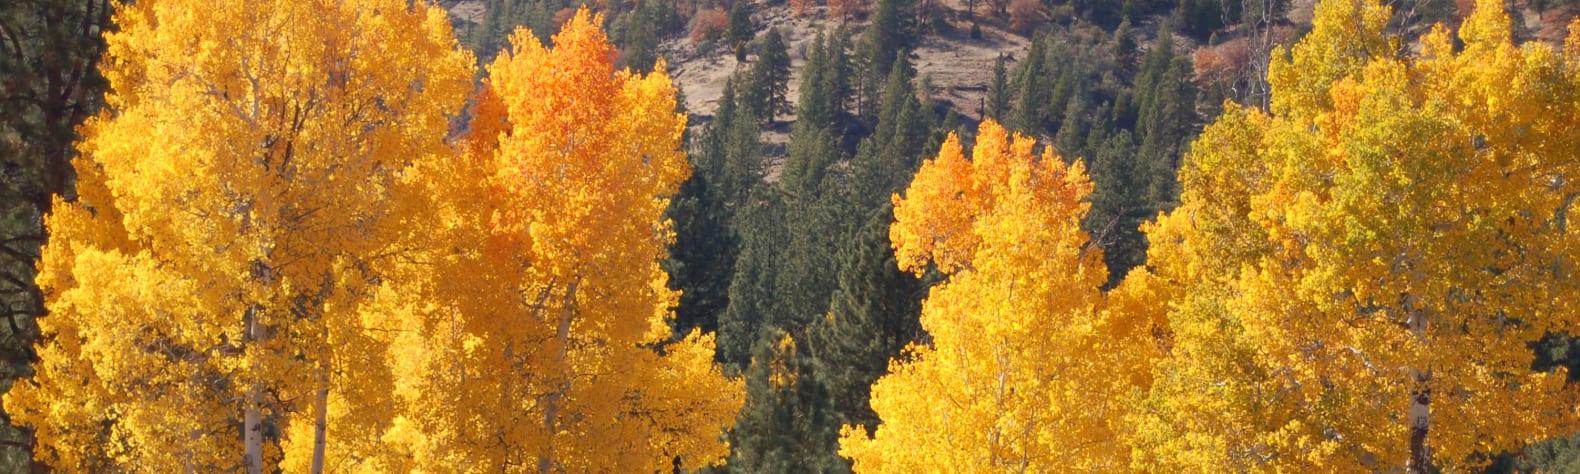 Plumas National Forest